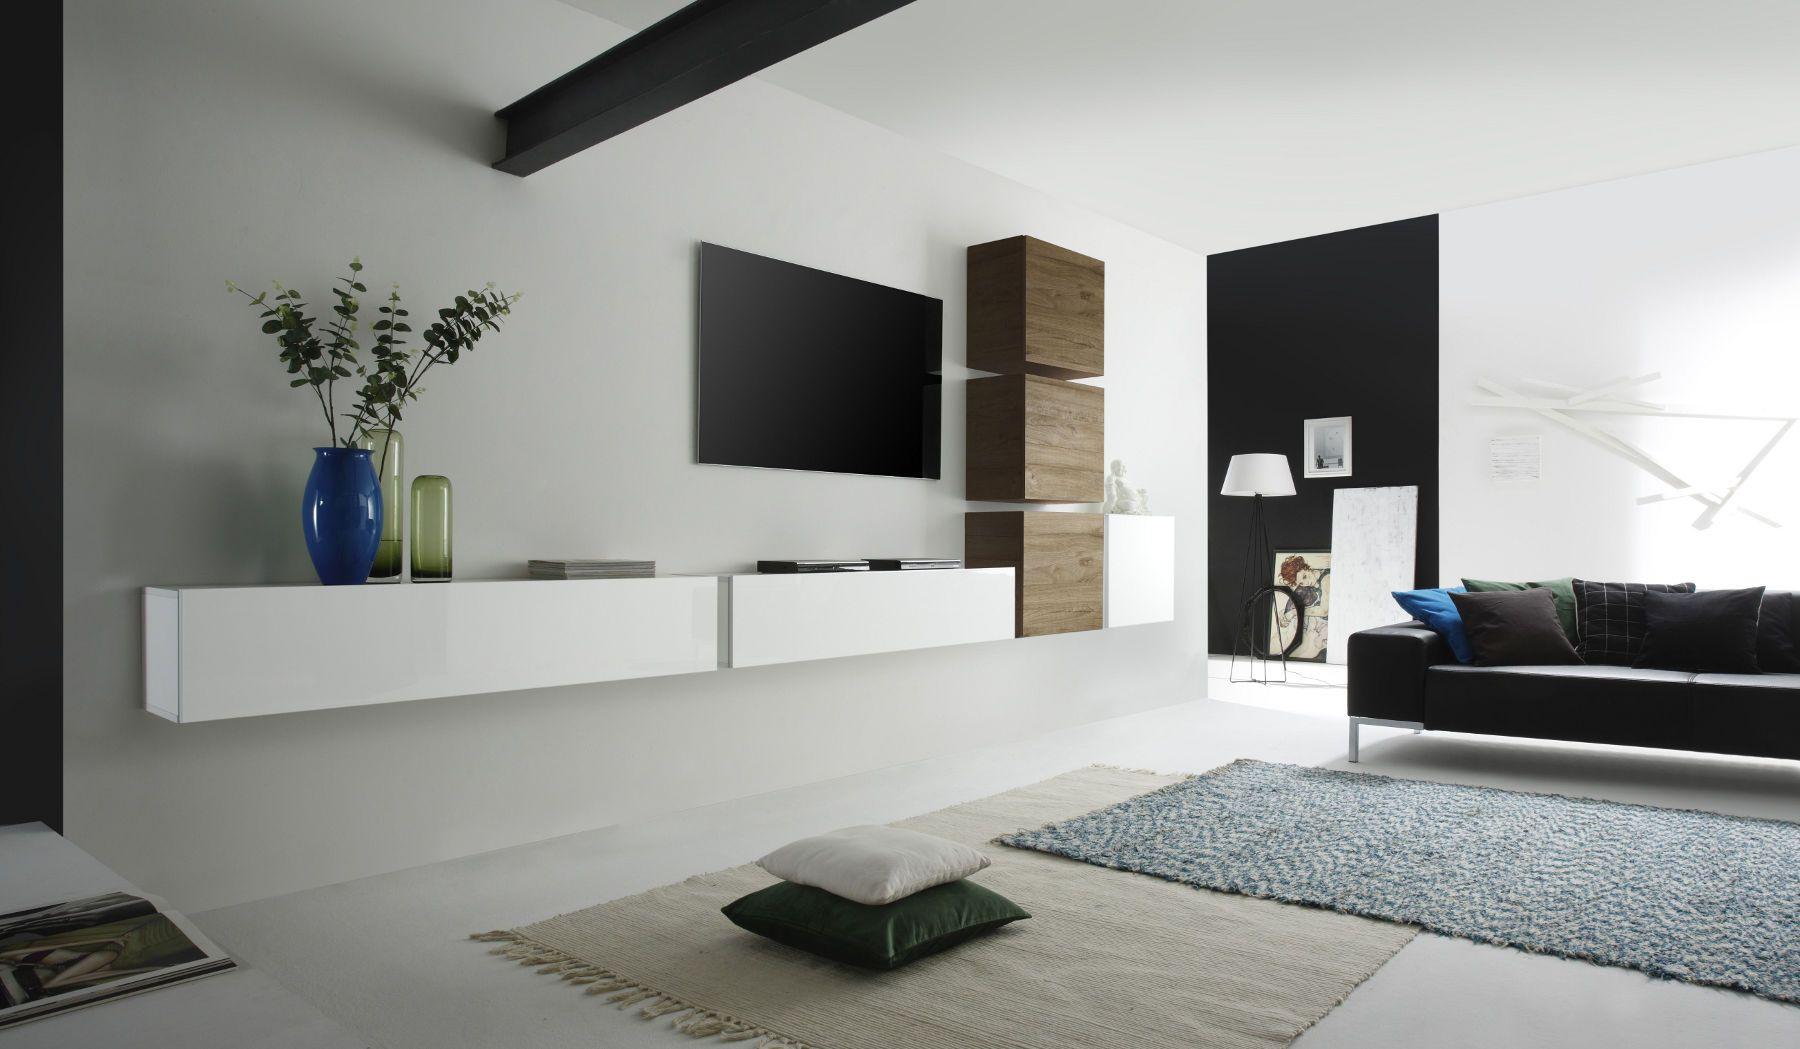 Moderne Wohnwand Weis Design - tubeimage.com